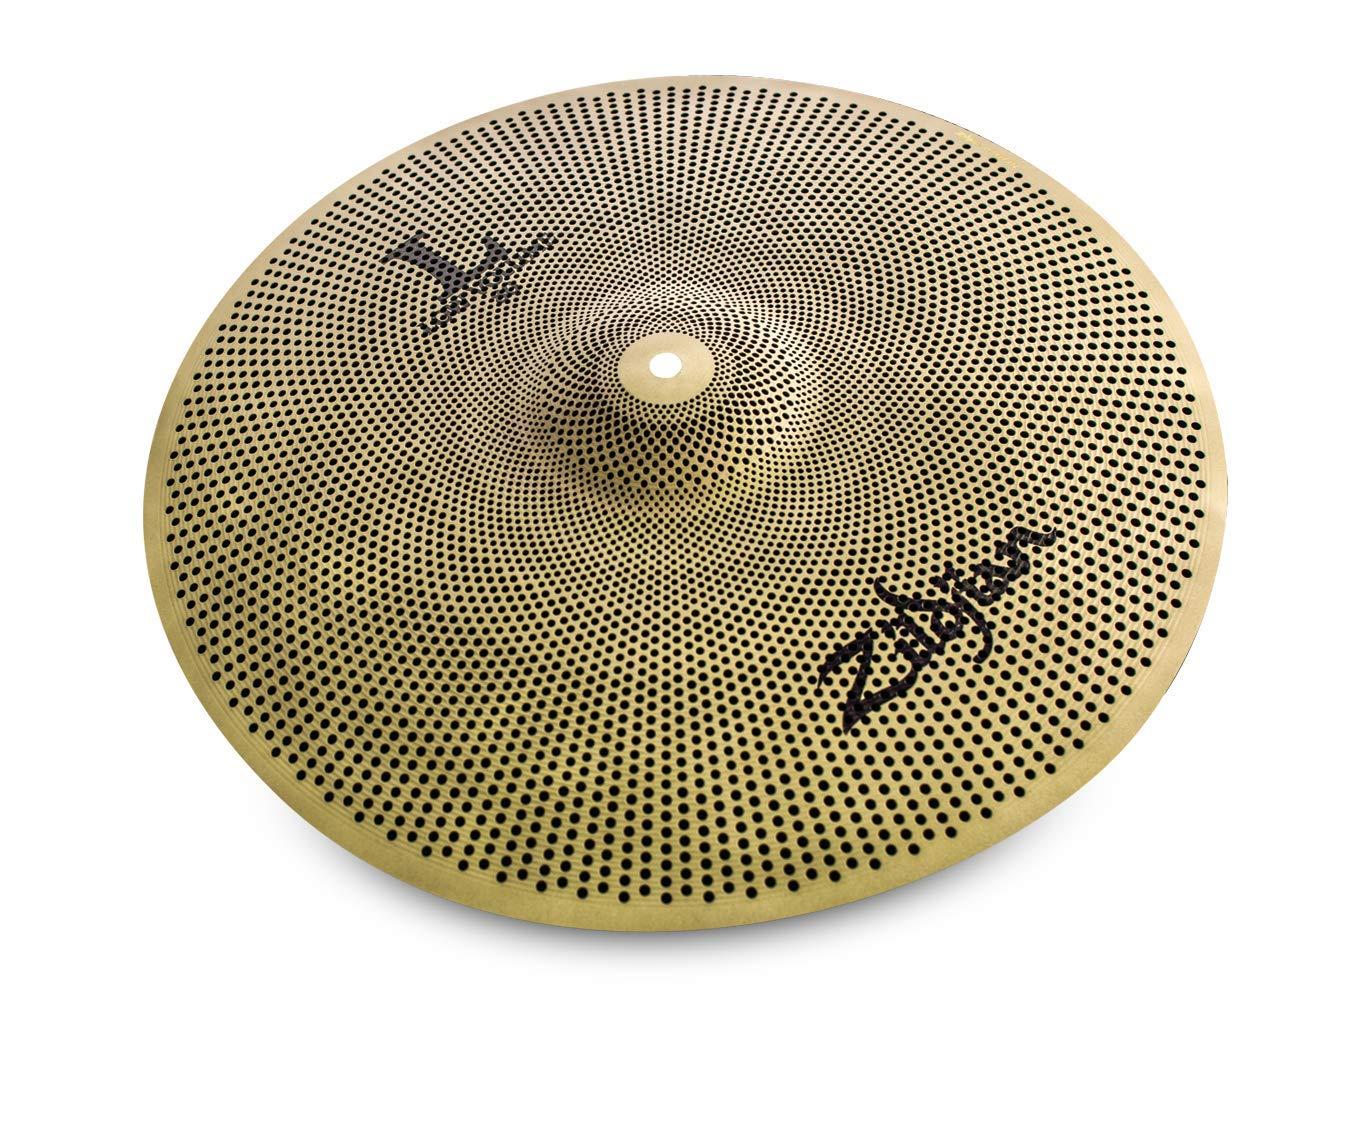 Zildjian L80 Low Volume 14/16/18 Cymbal Set by Avedis Zildjian Company (Image #4)